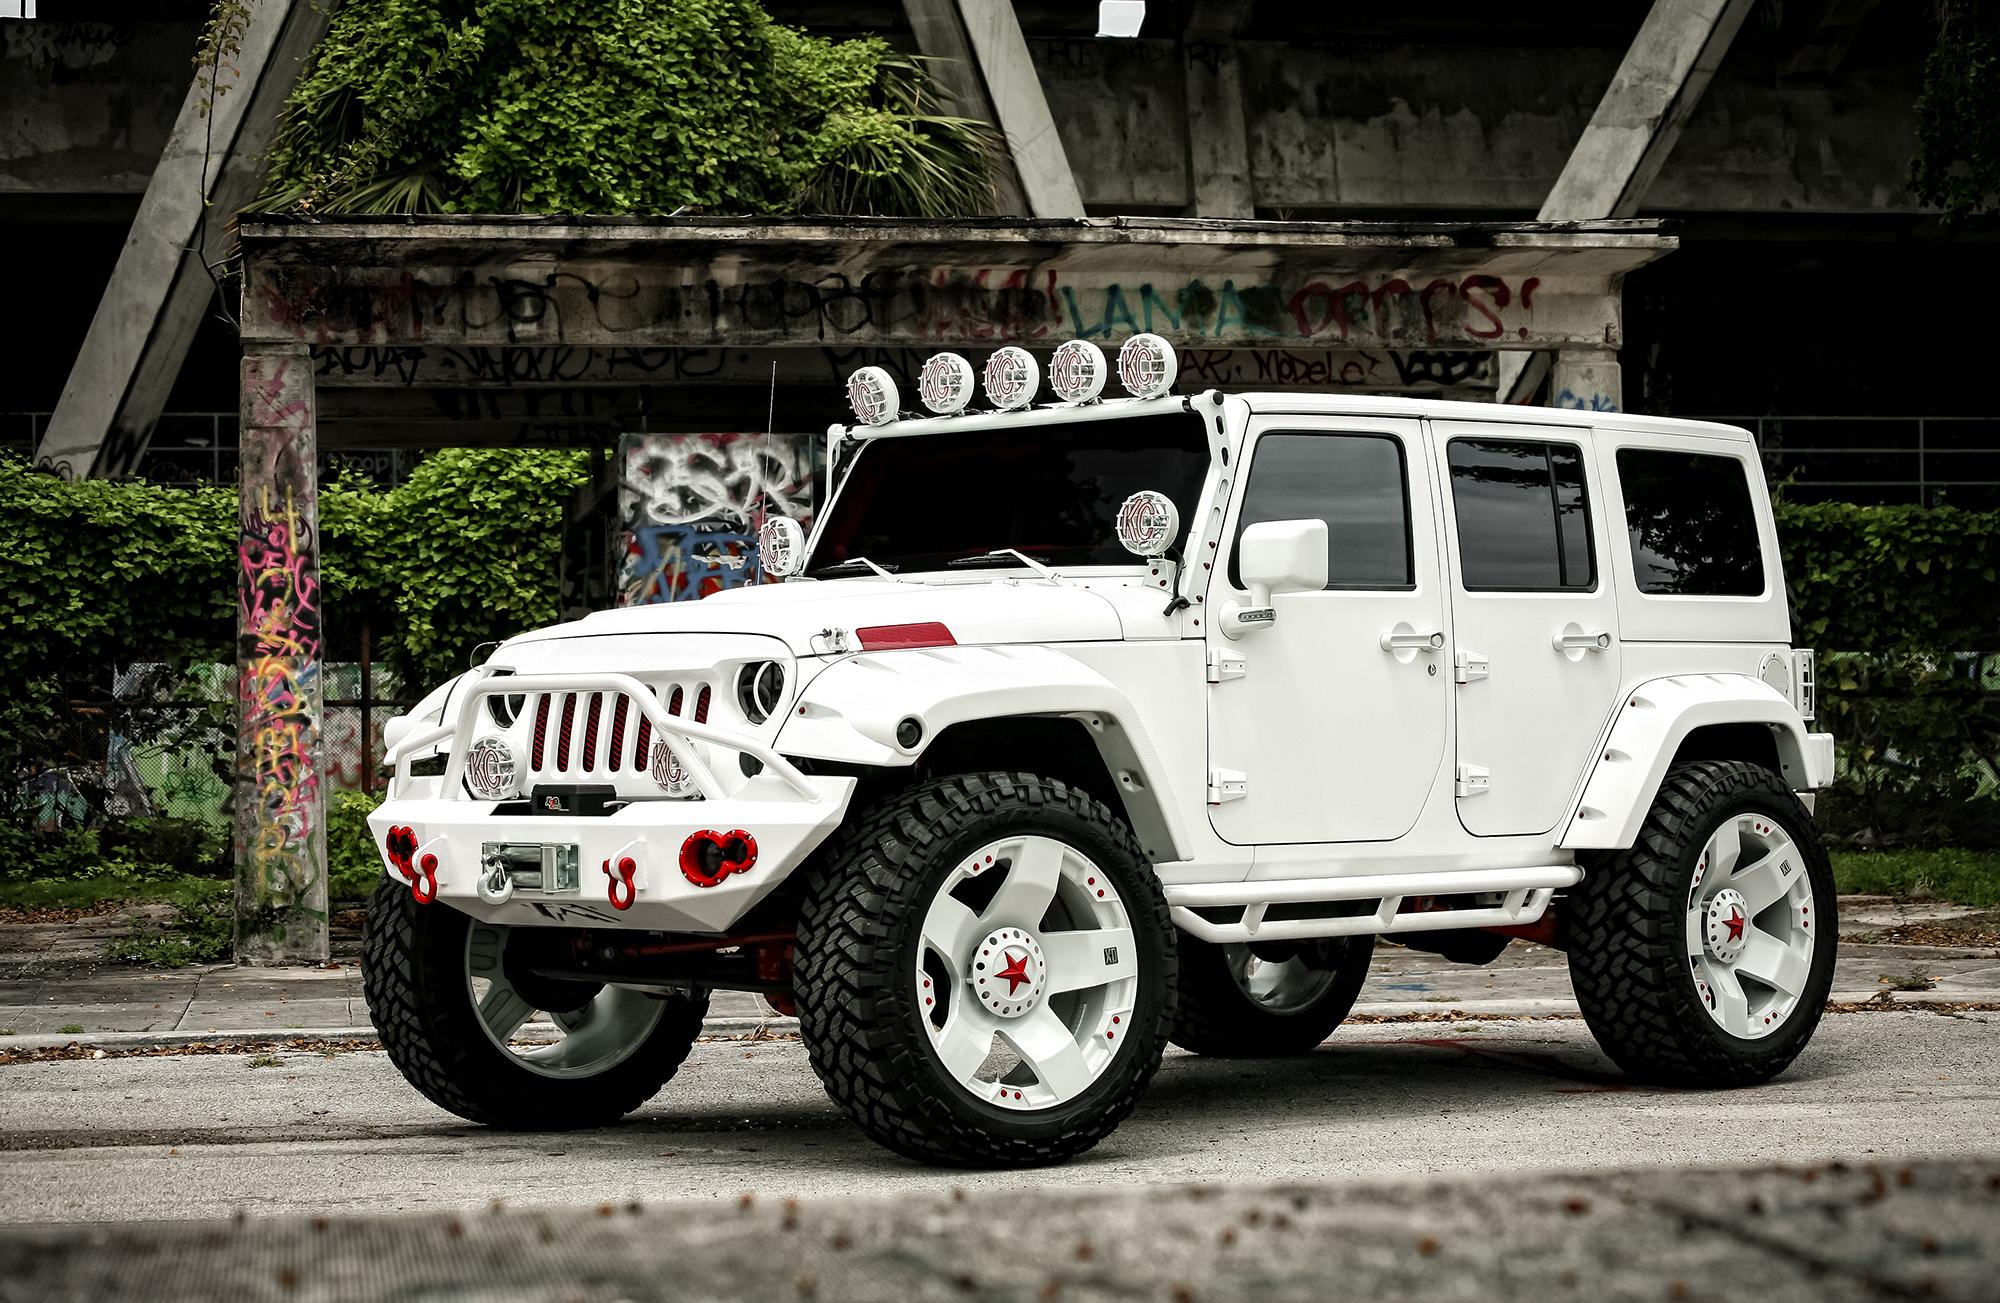 Lifted Jeep Srt8 >> White Jeep Wrangler Wallpaper - WallpaperSafari